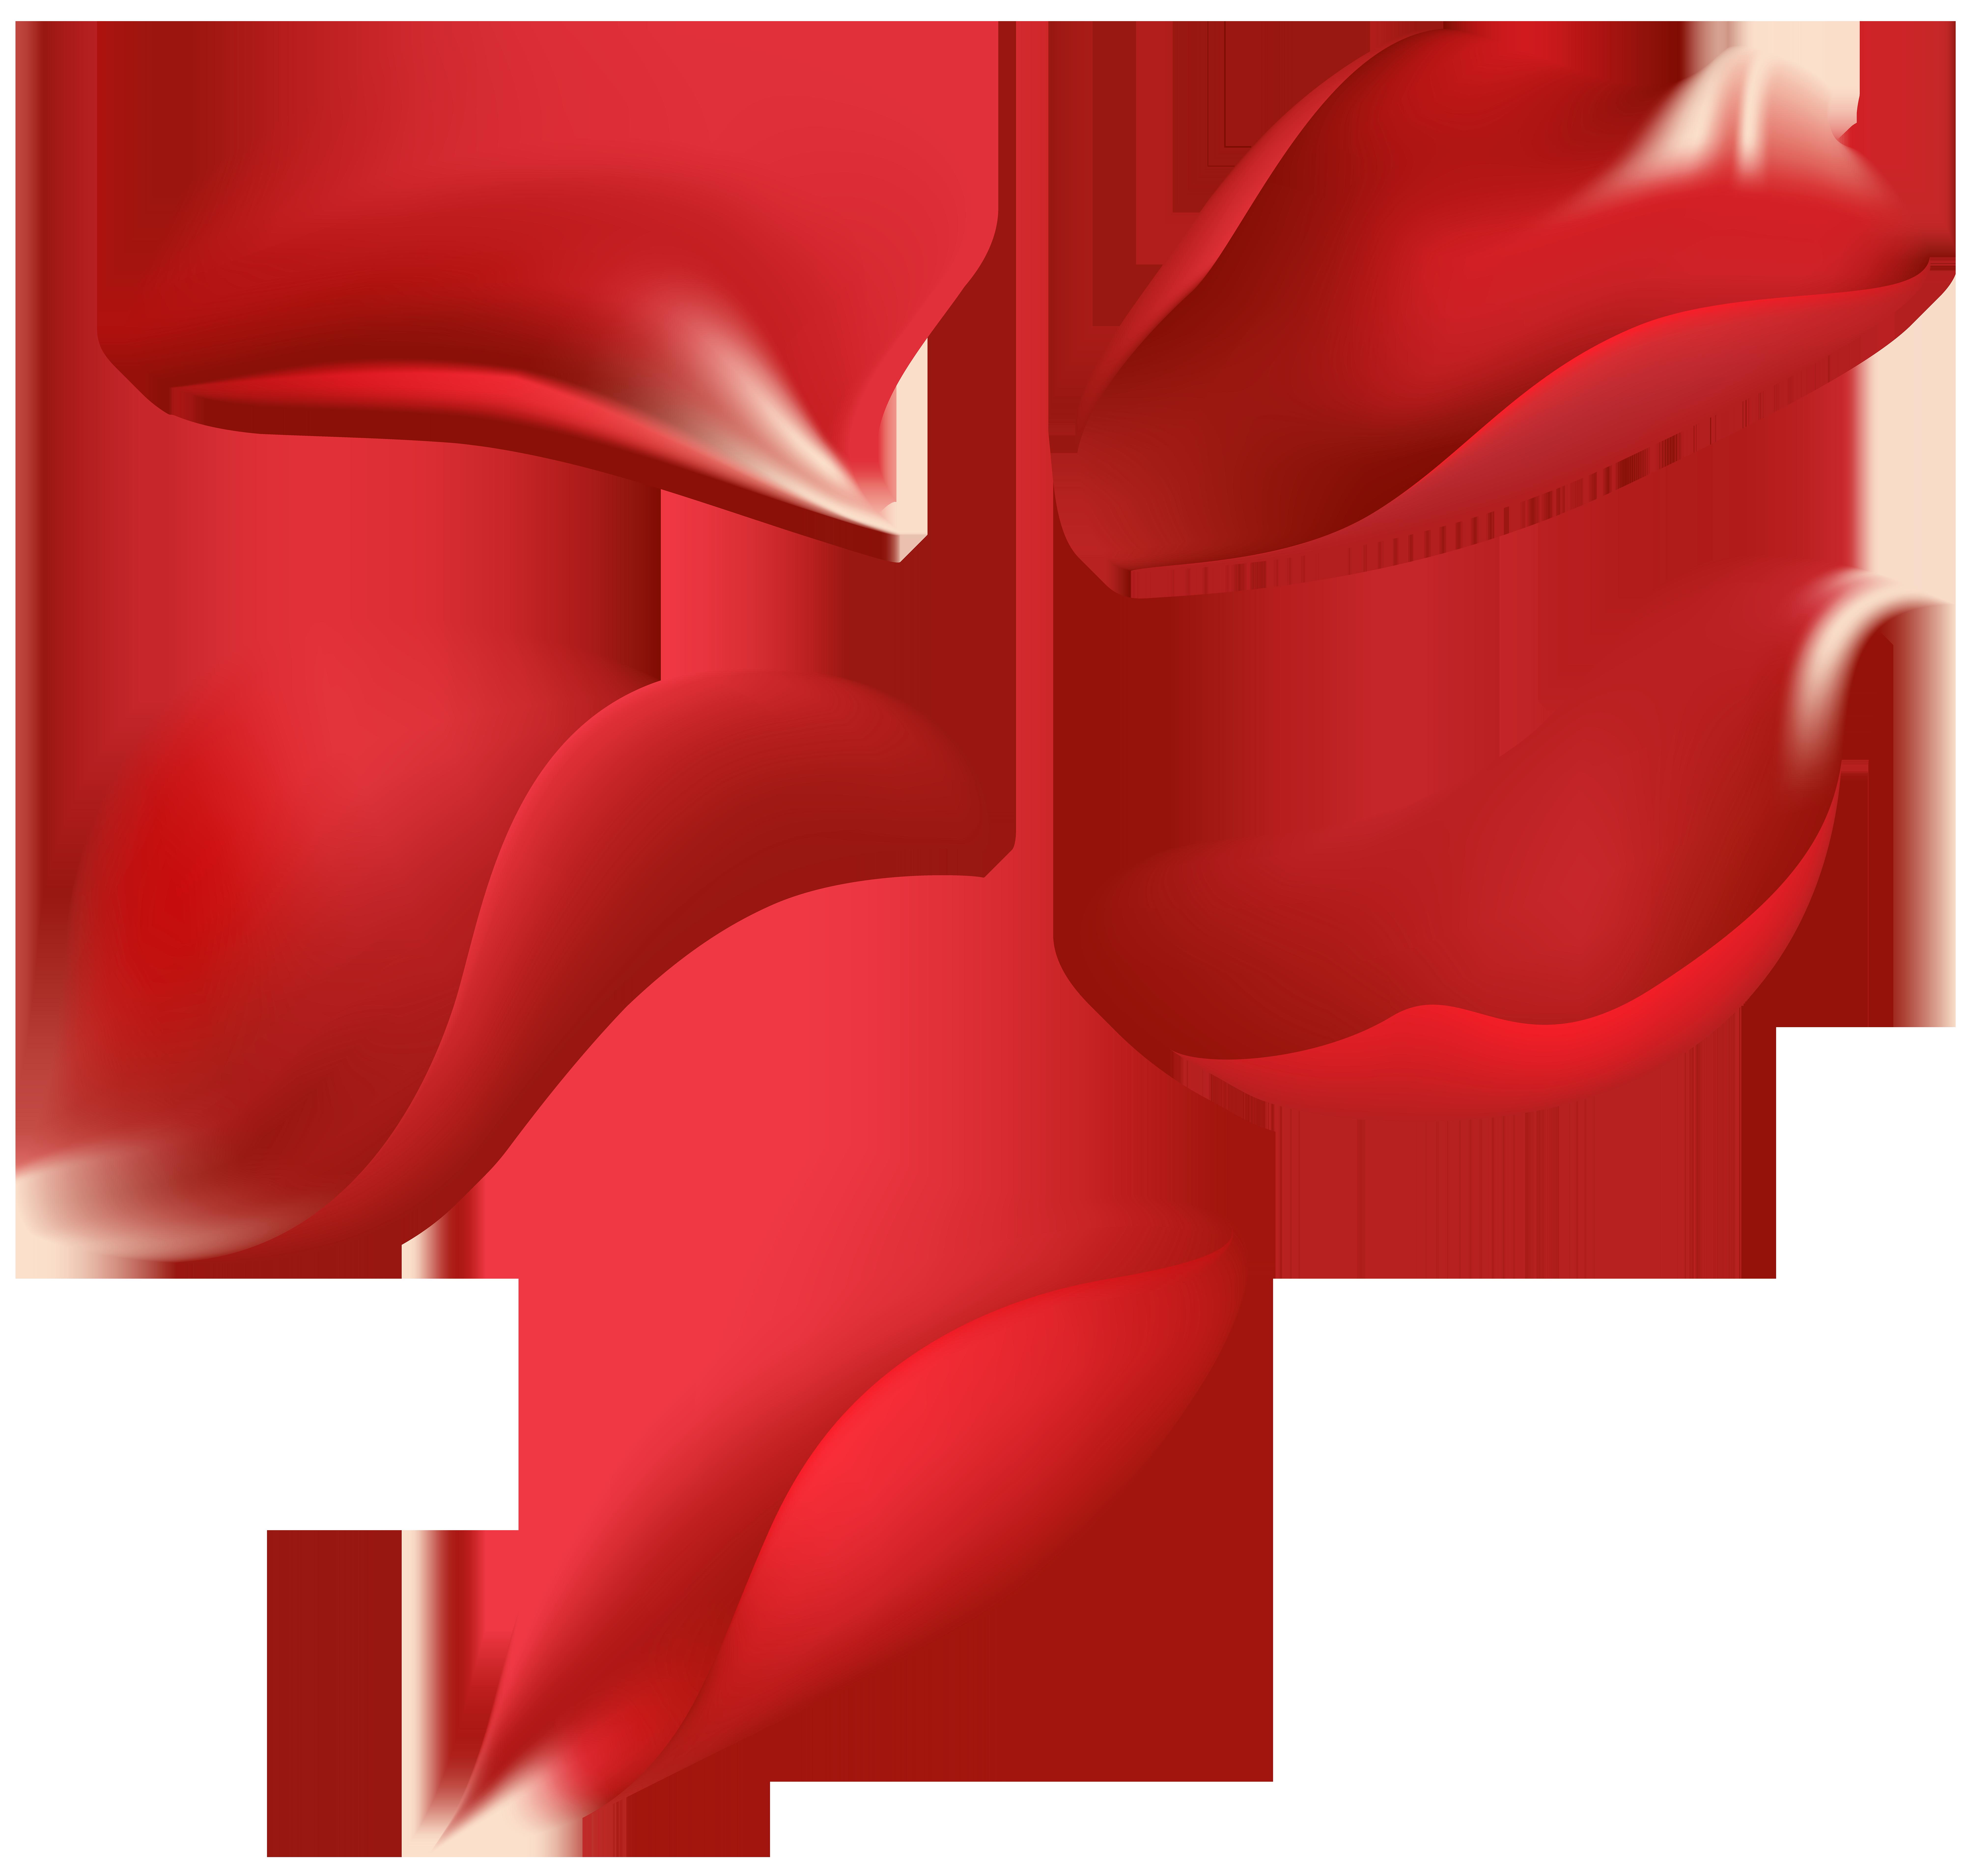 8000x7638 Red Rose Petals Transparent Clip Art Imageu200b Gallery Yopriceville